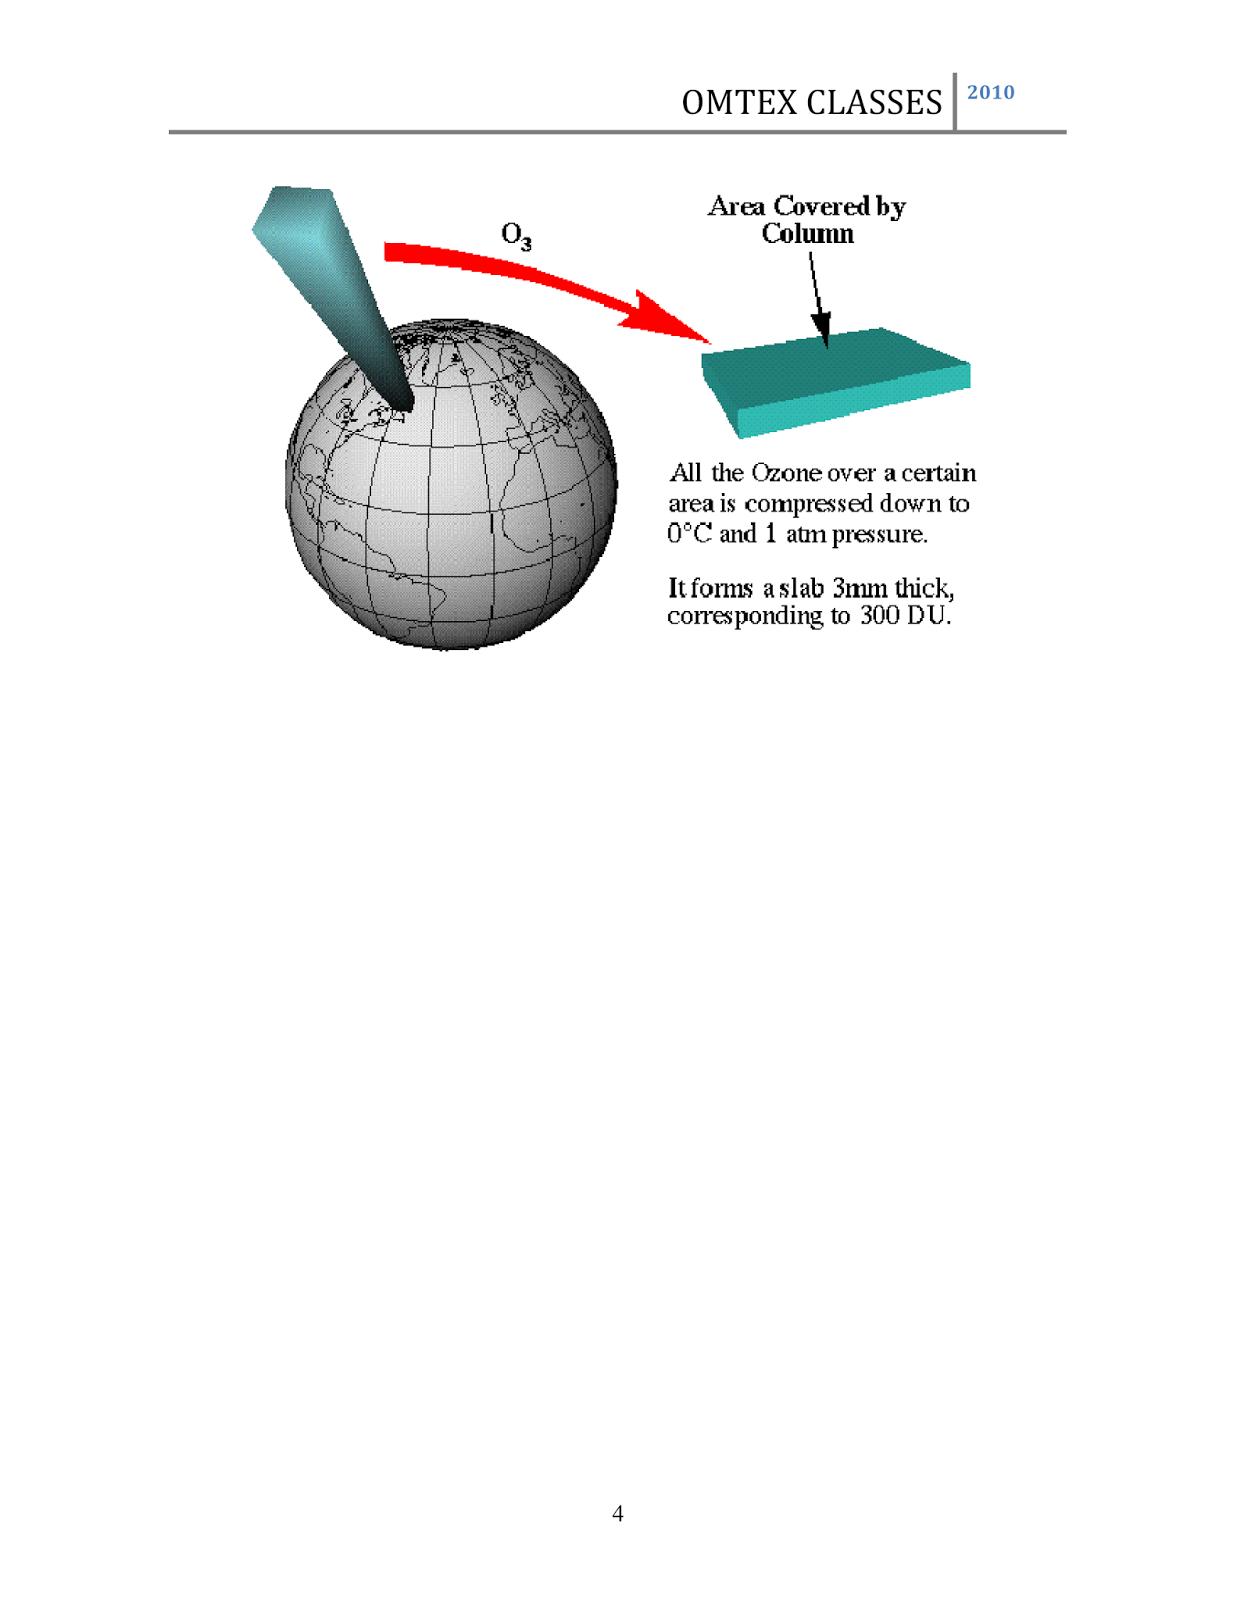 essays on ozone layer depletion